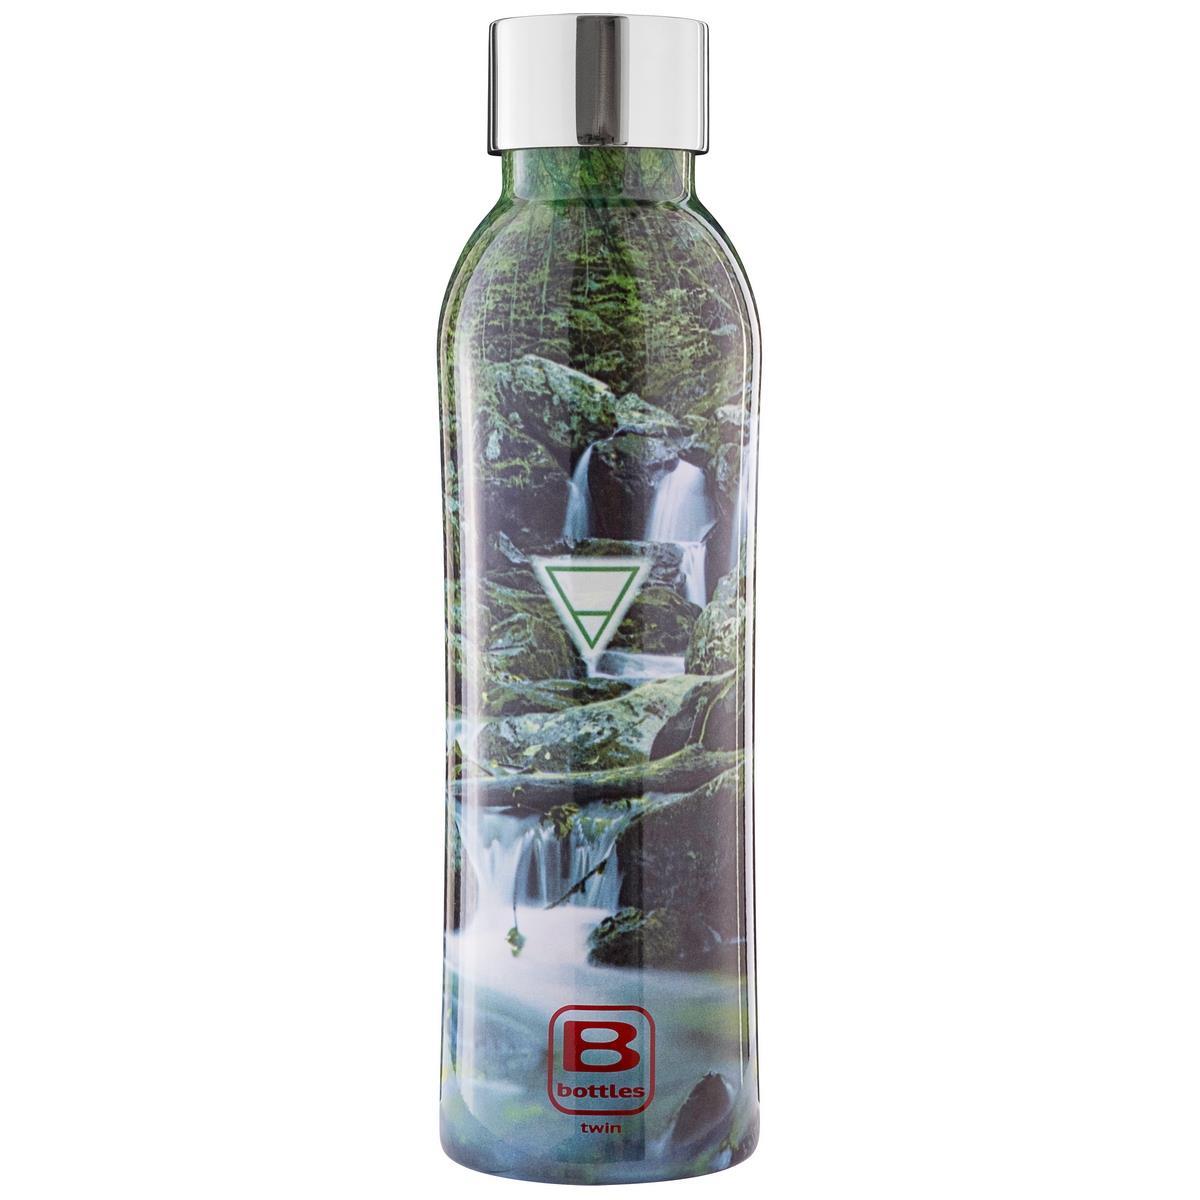 B Bottles Twin - Terra Element - 500 ml - Bottiglia Termica a doppia parete in acciaio inox 18/10